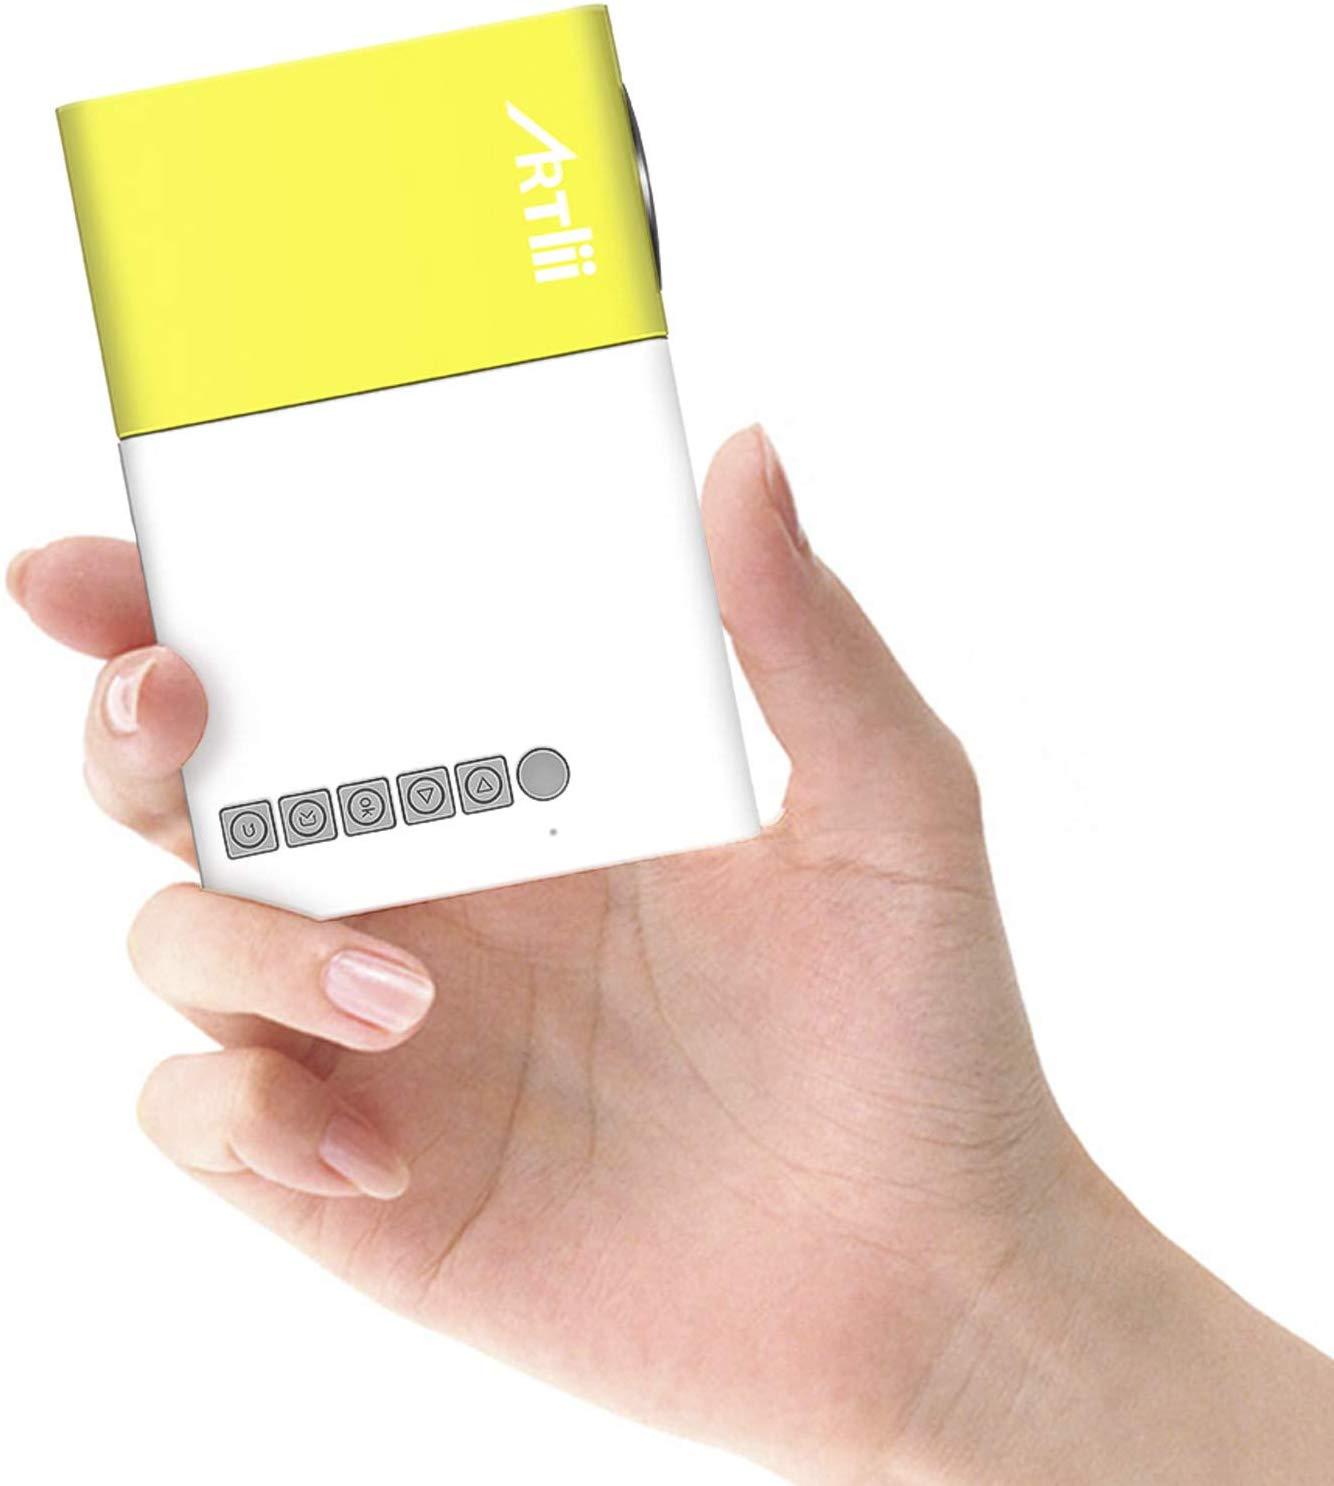 Artlii 2019 New Pocket Projector